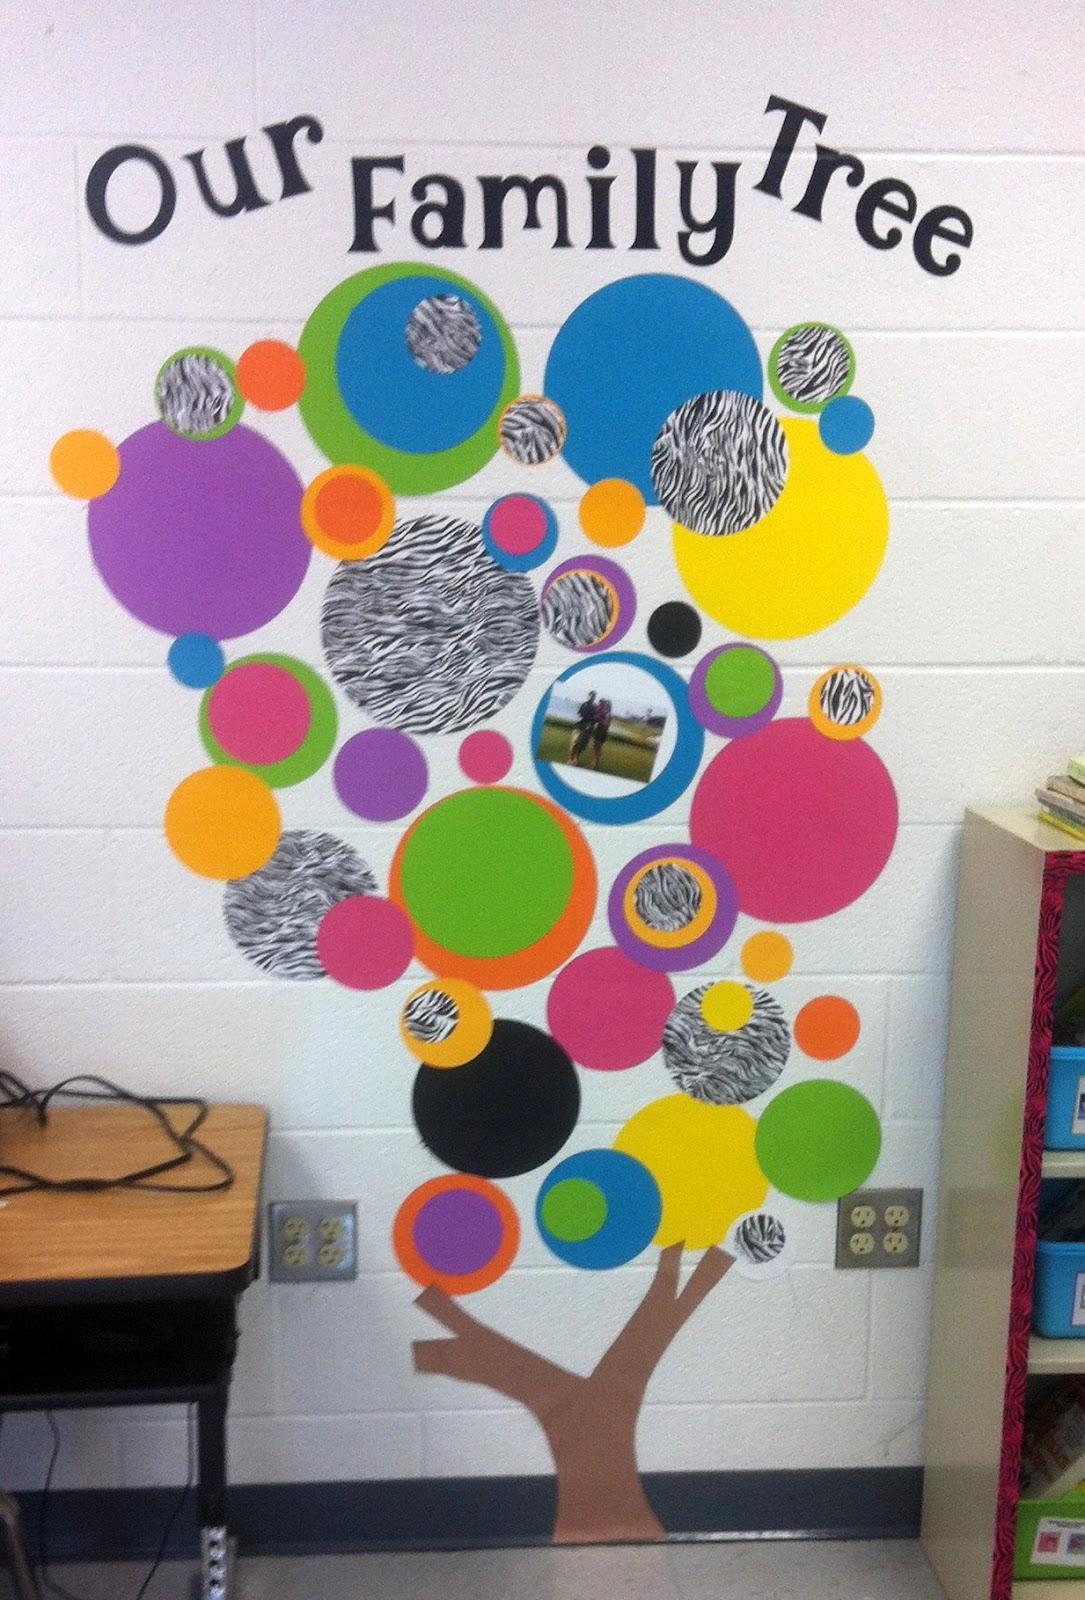 Preschool Classroom Family Tree Ideas ~ Everyday giggles monday make it family tree for classroom